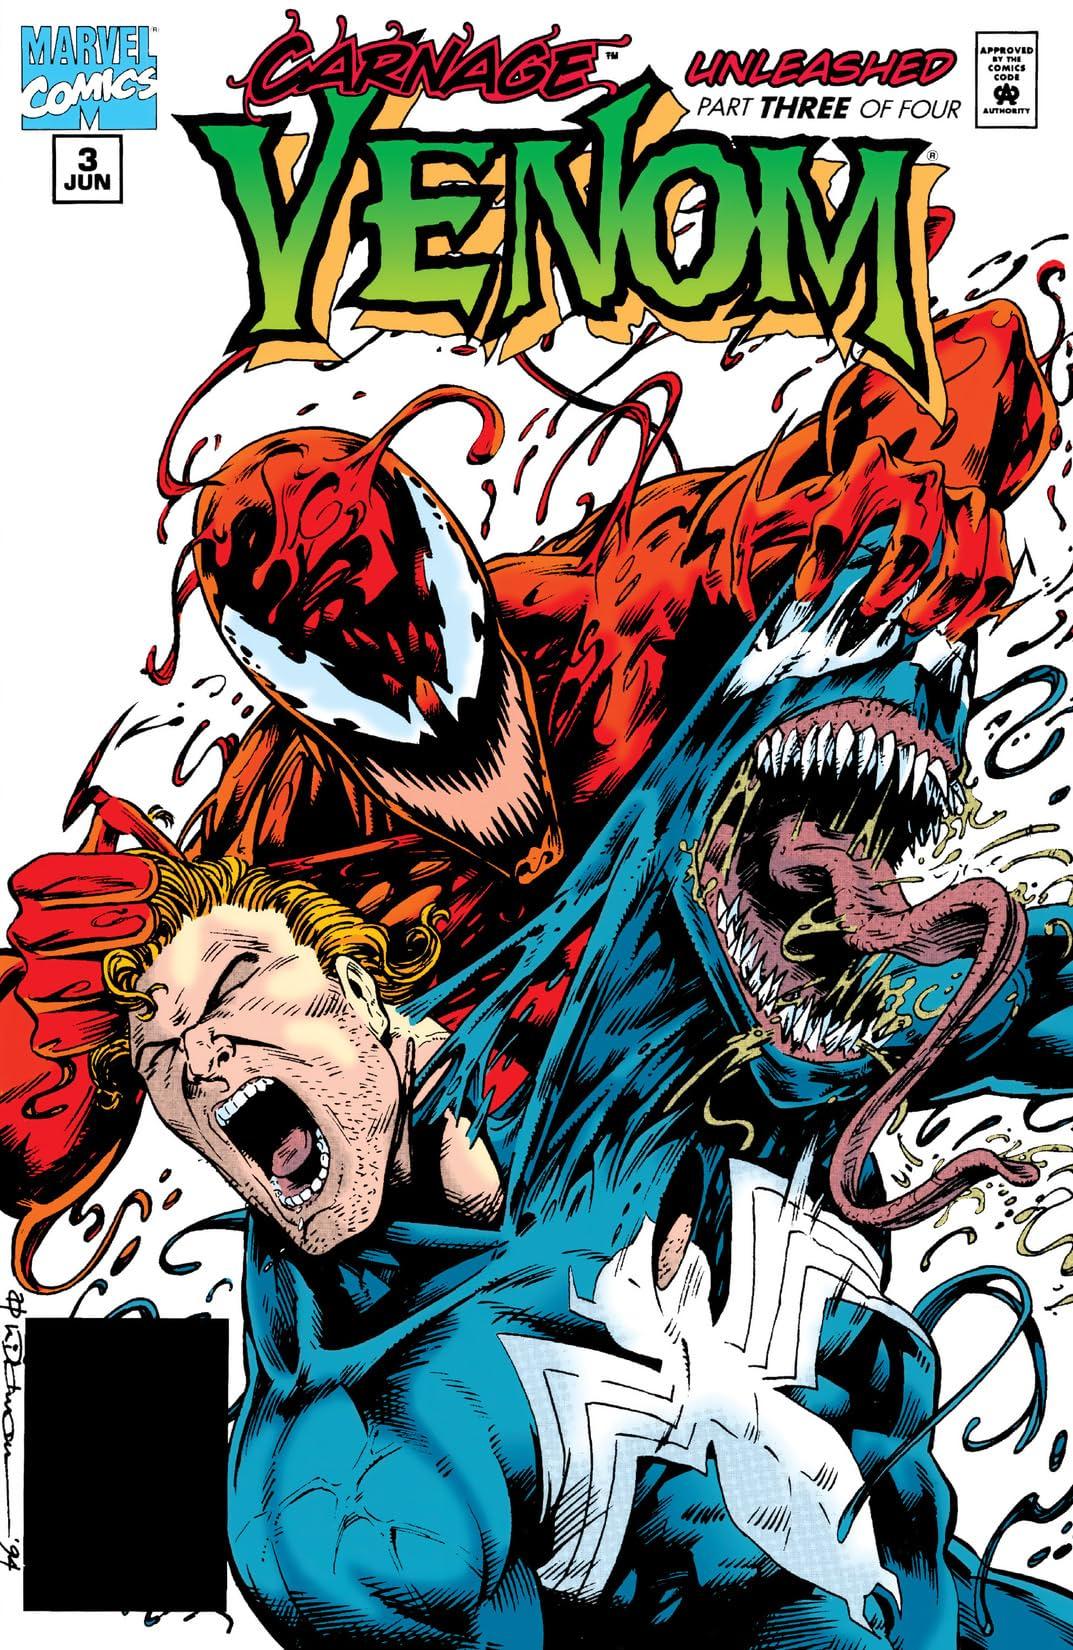 Venom: Carnage Unleashed (1995) #3 (of 4)